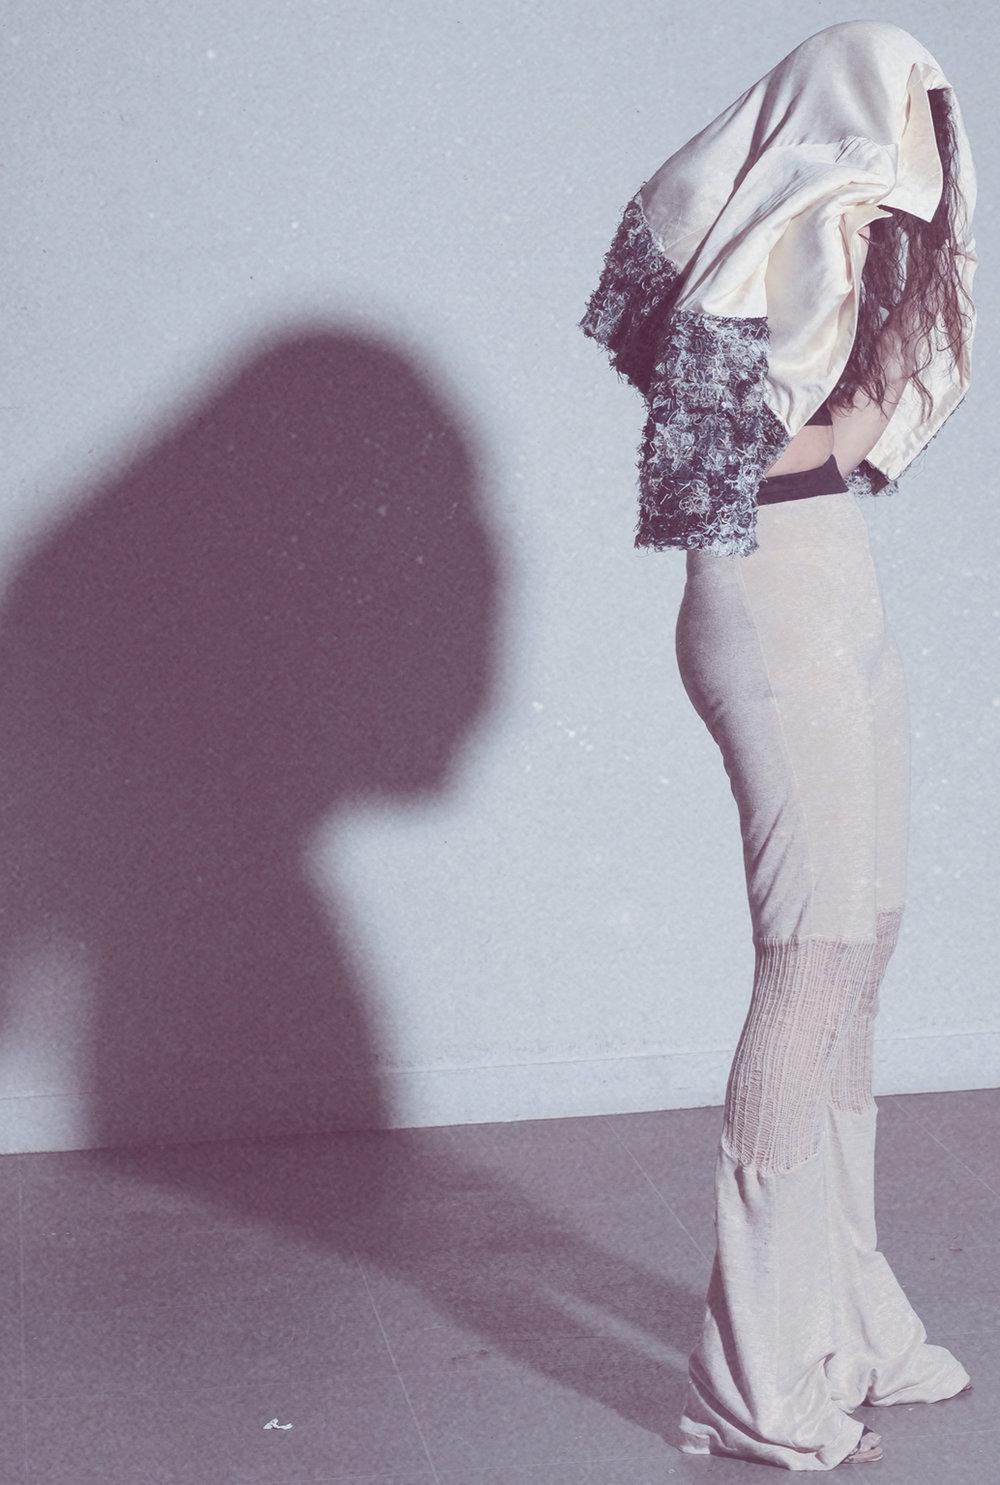 Photo5-Blazer and trousers Unravelau, top G-Star.jpg